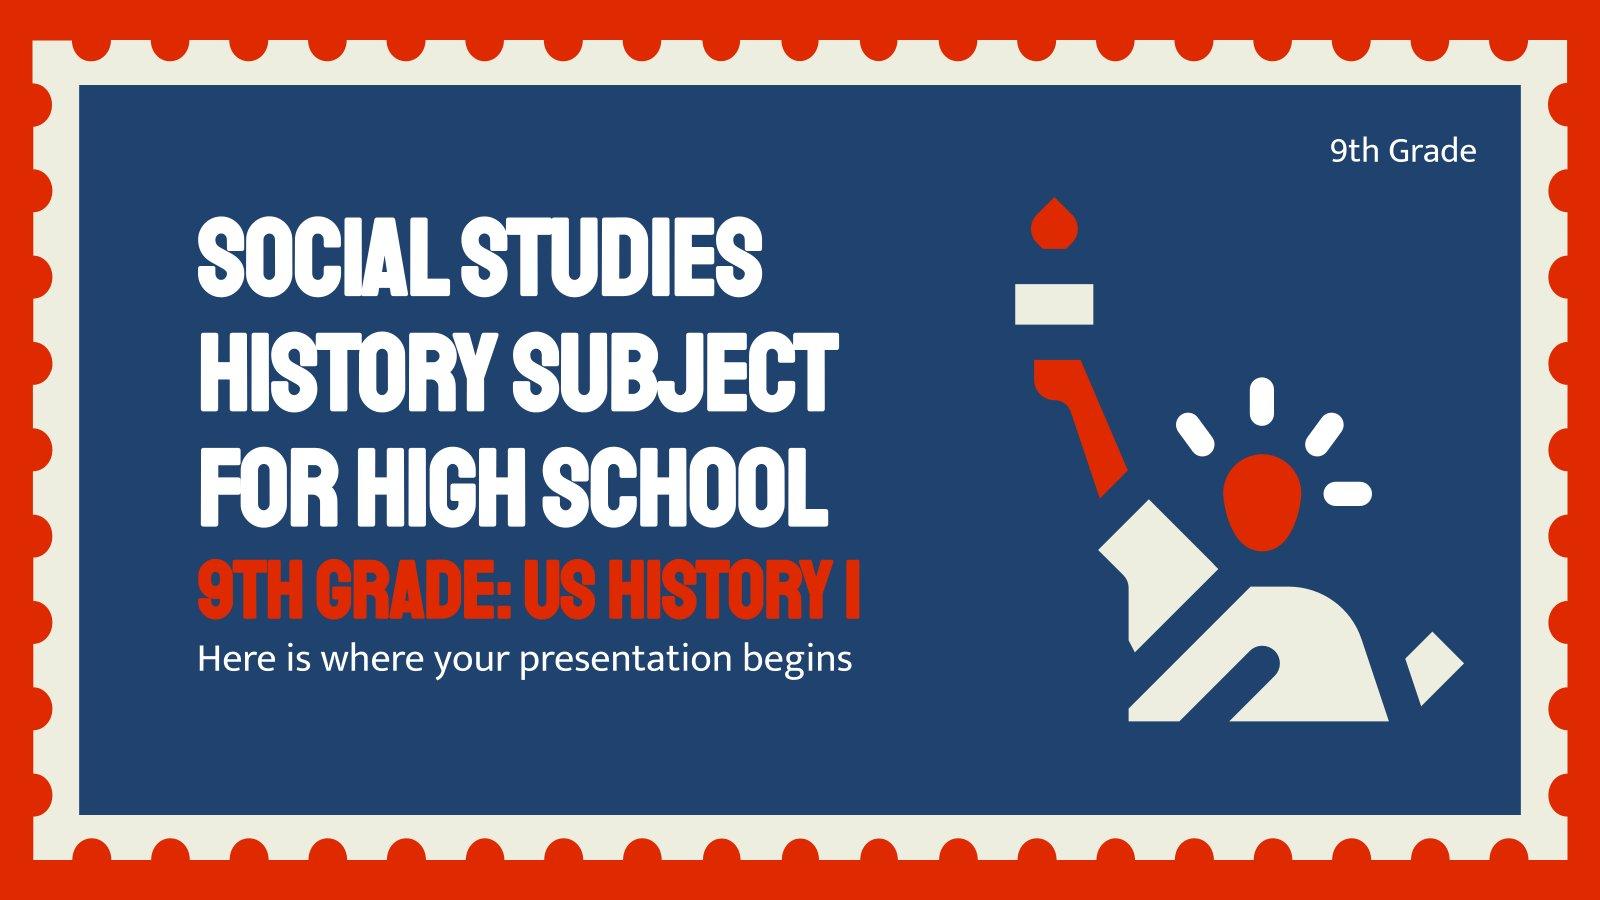 Social Studies/History Subject for High School - 9th Grade: US History I presentation template